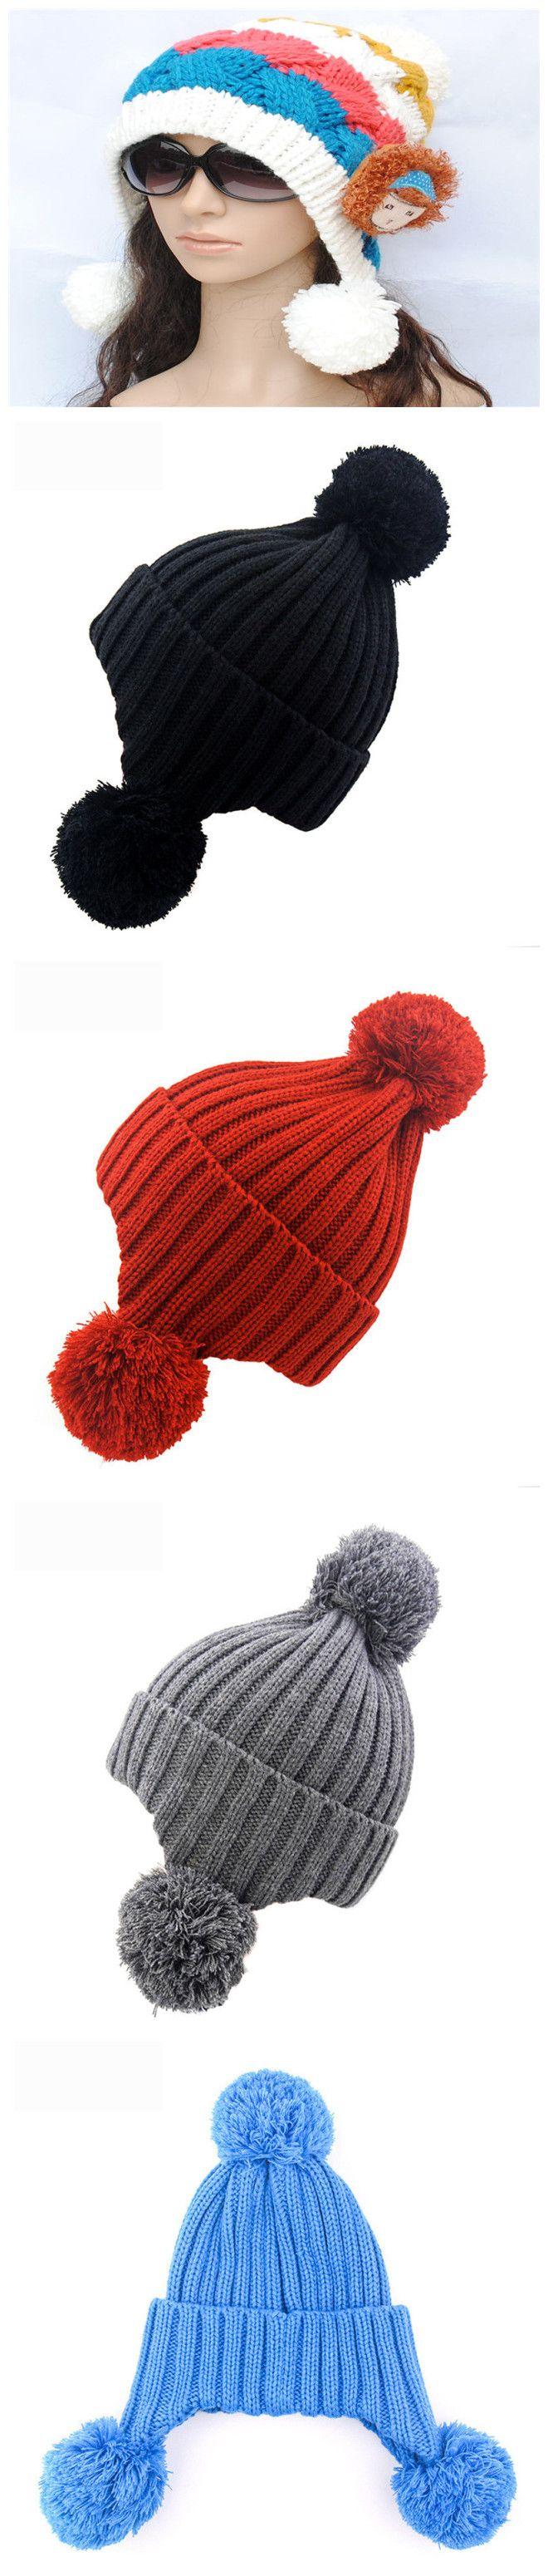 #fashion#popular#New Style#Beauty#Ladies winter hats